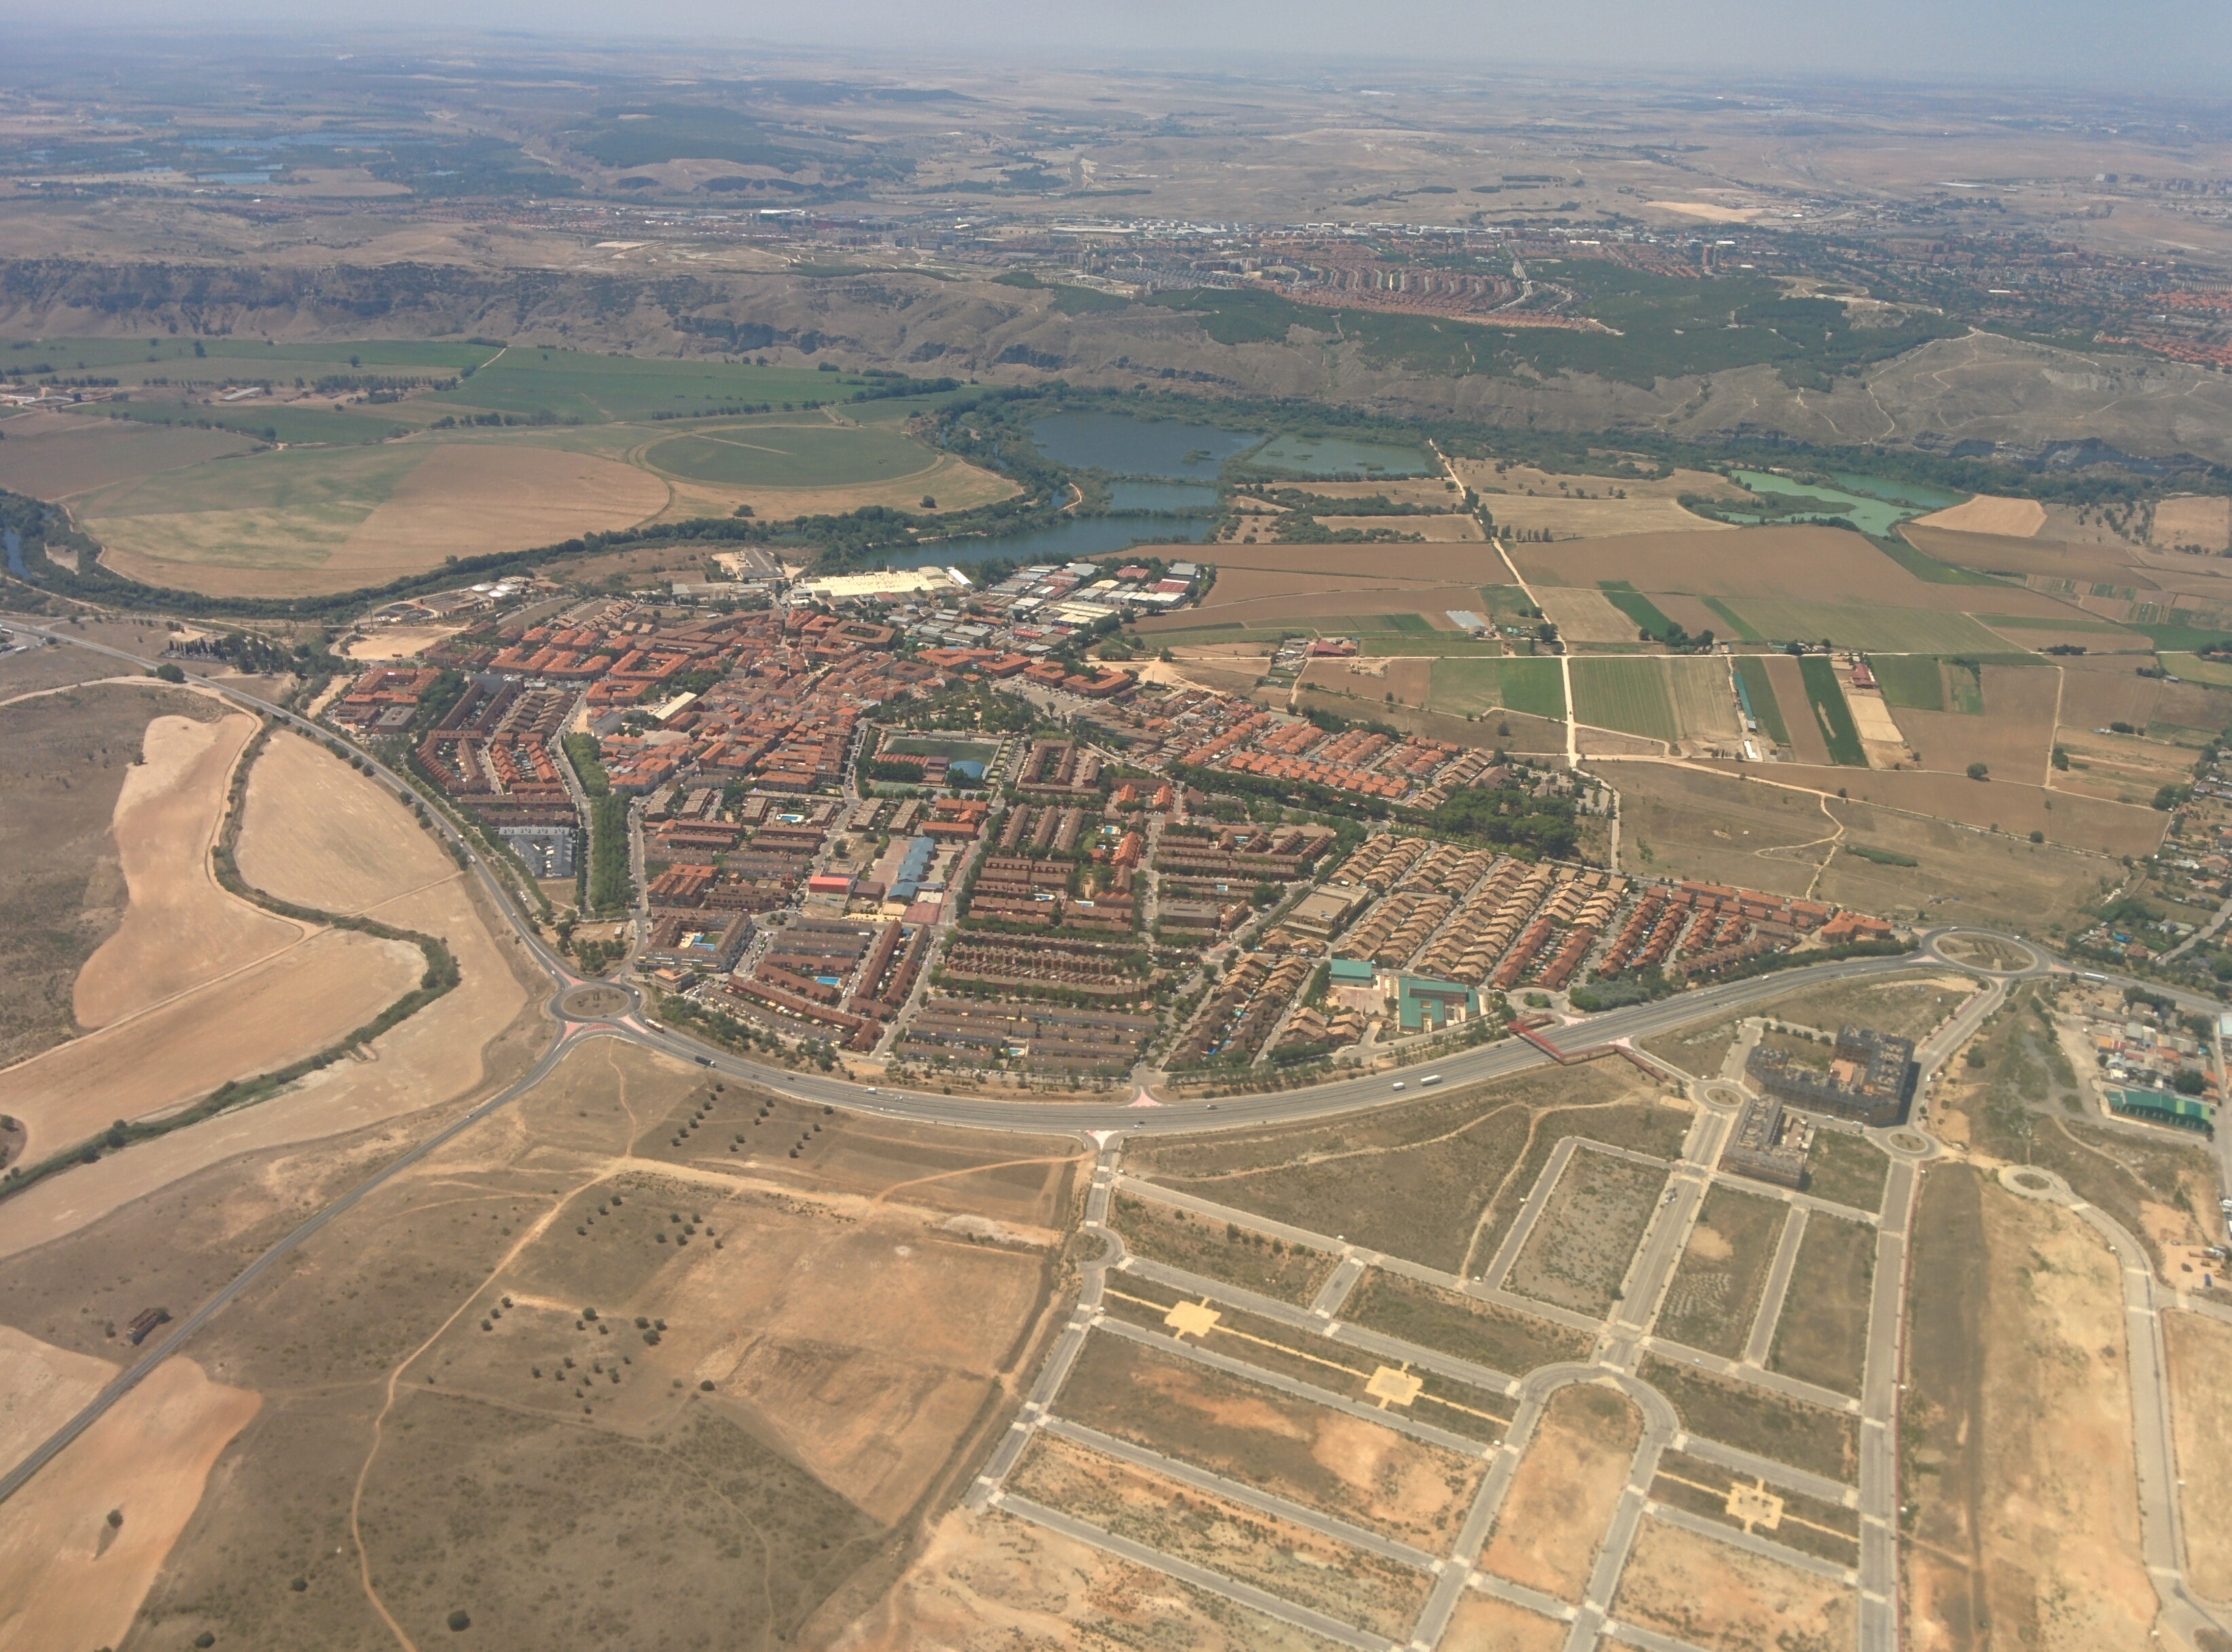 Archivo velilla de san antonio vista a - Inmobiliaria velilla de san antonio ...